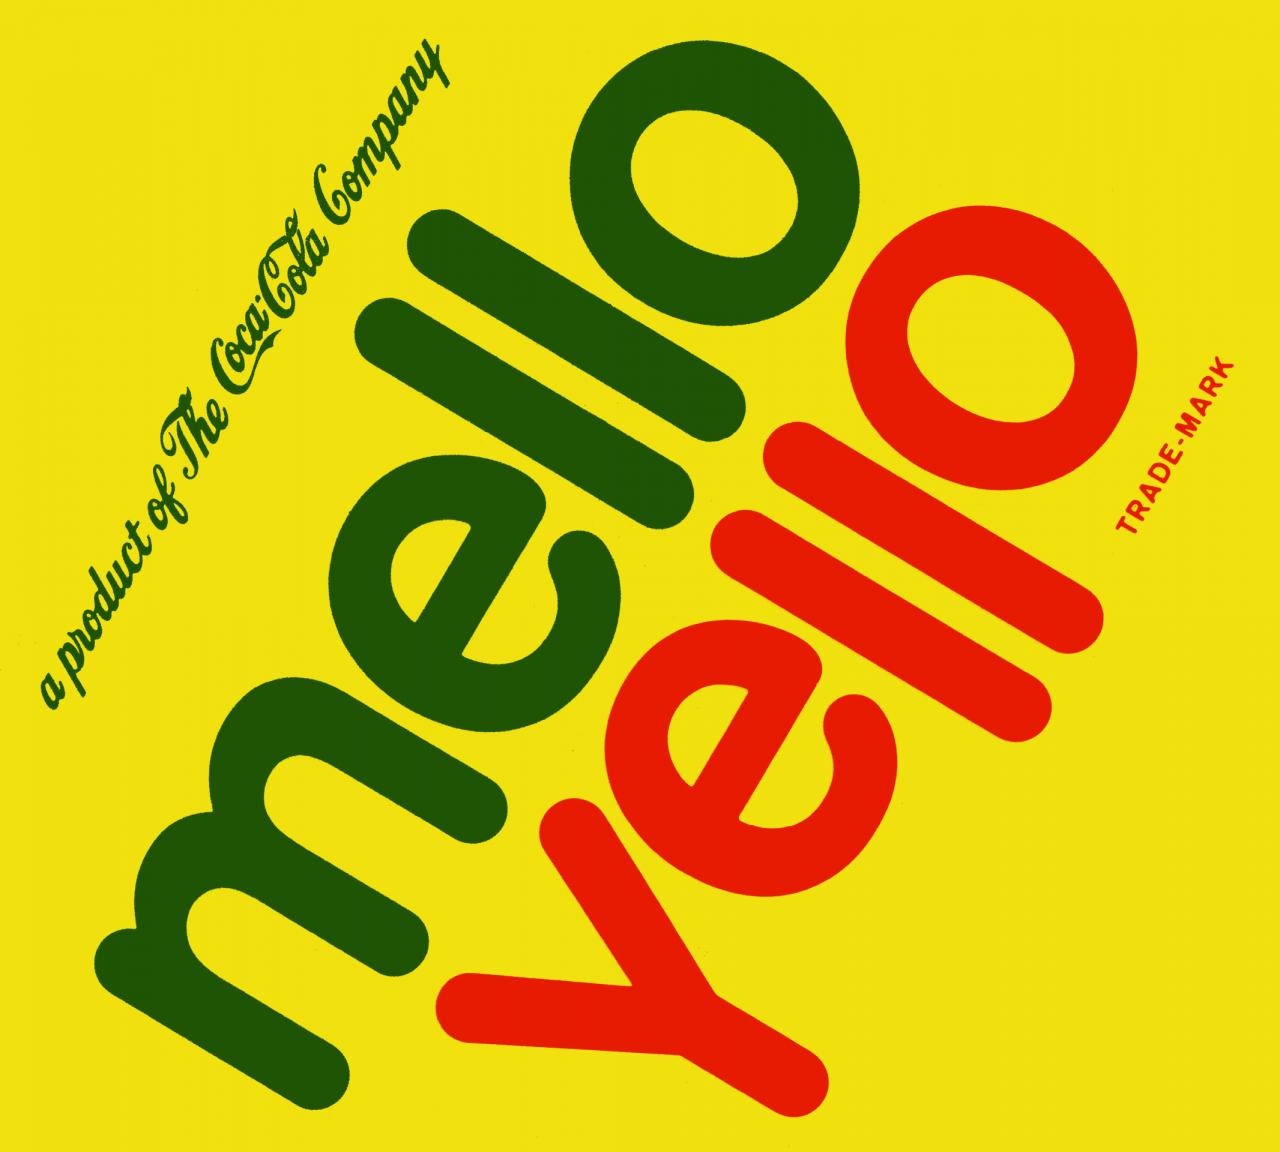 Mello0s_convert_20170407010538.png